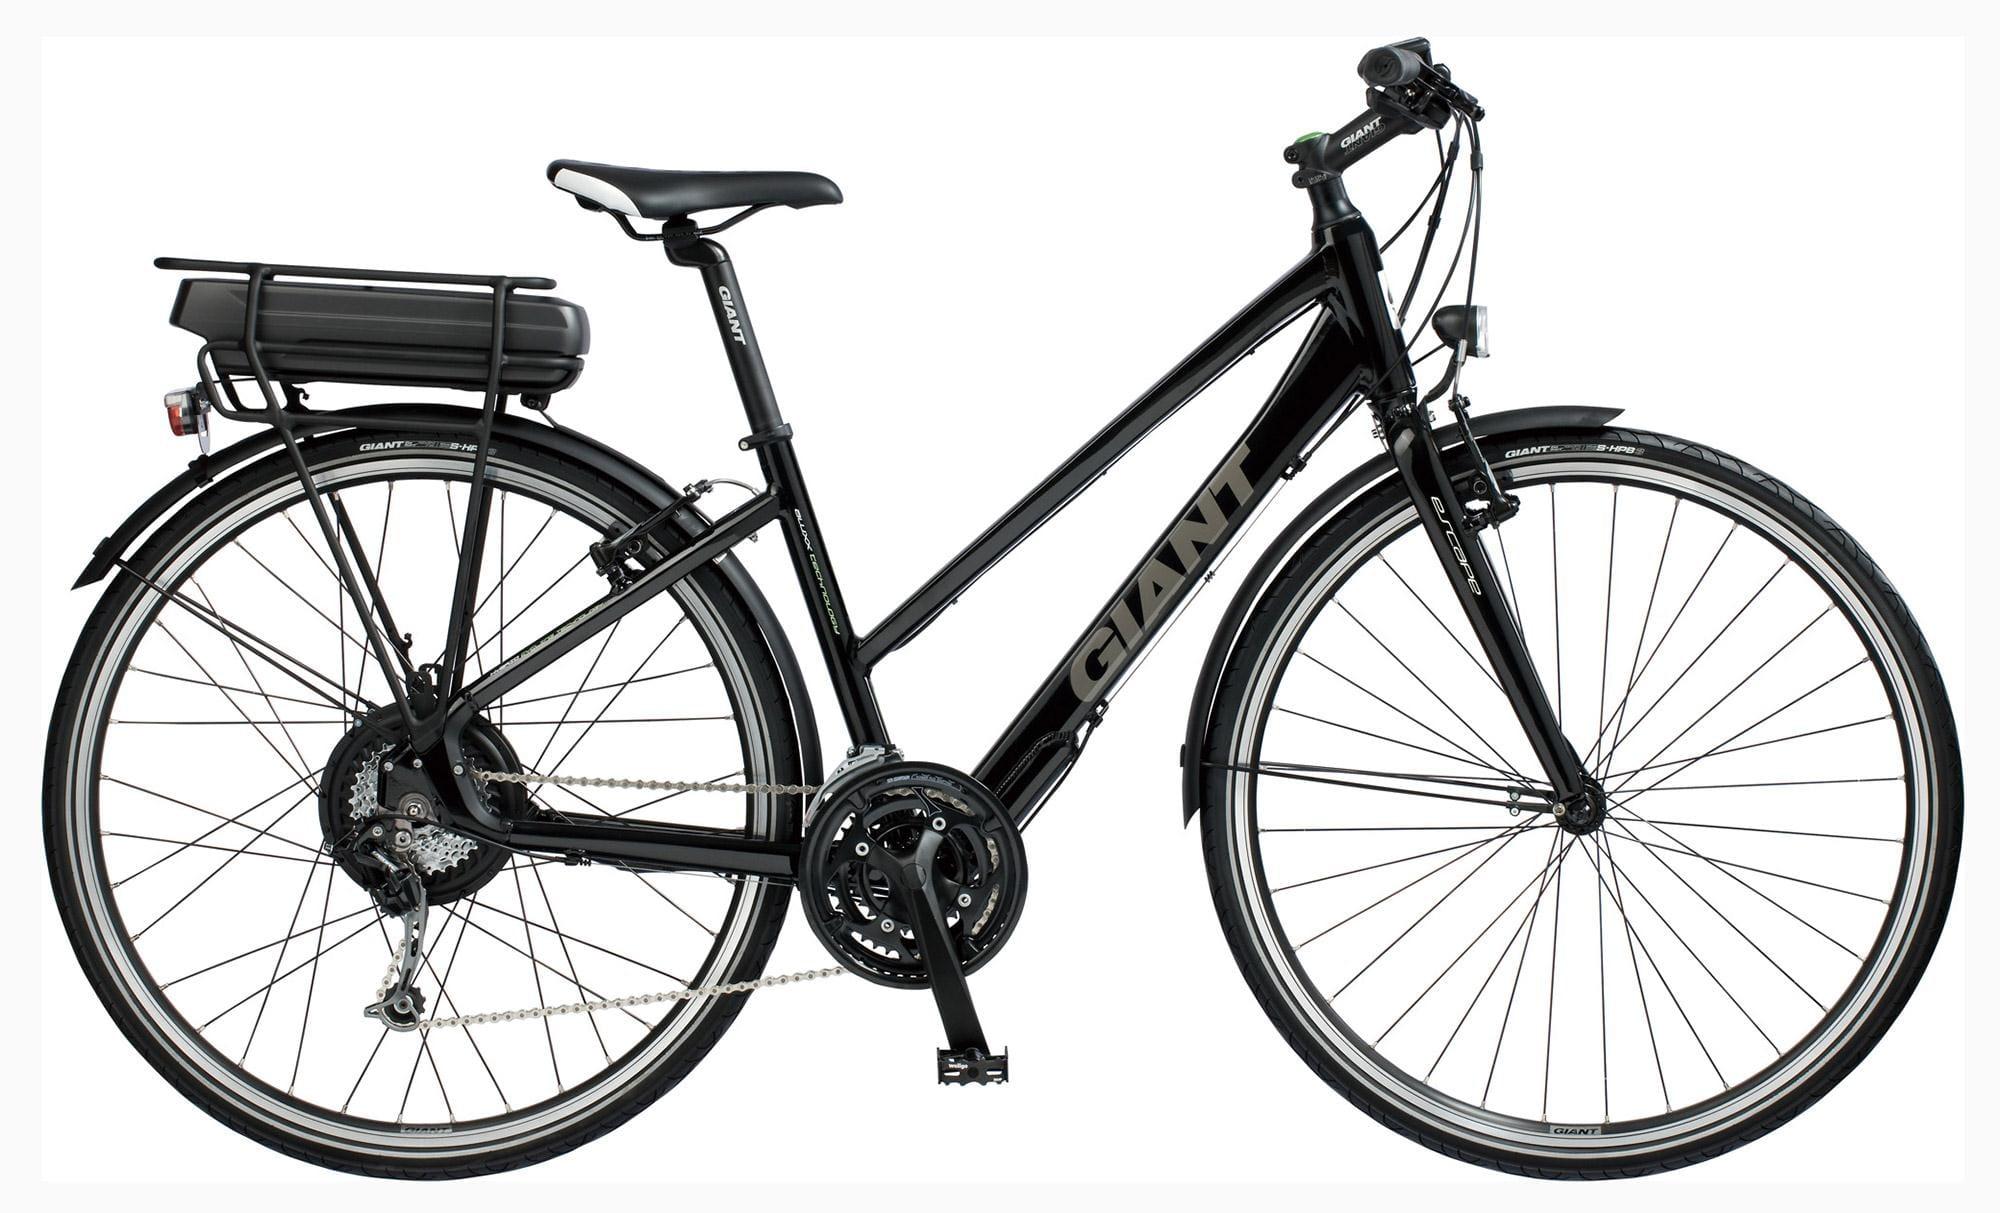 Giant 2015 Escape E Ladies Bike All Terrain Cycles